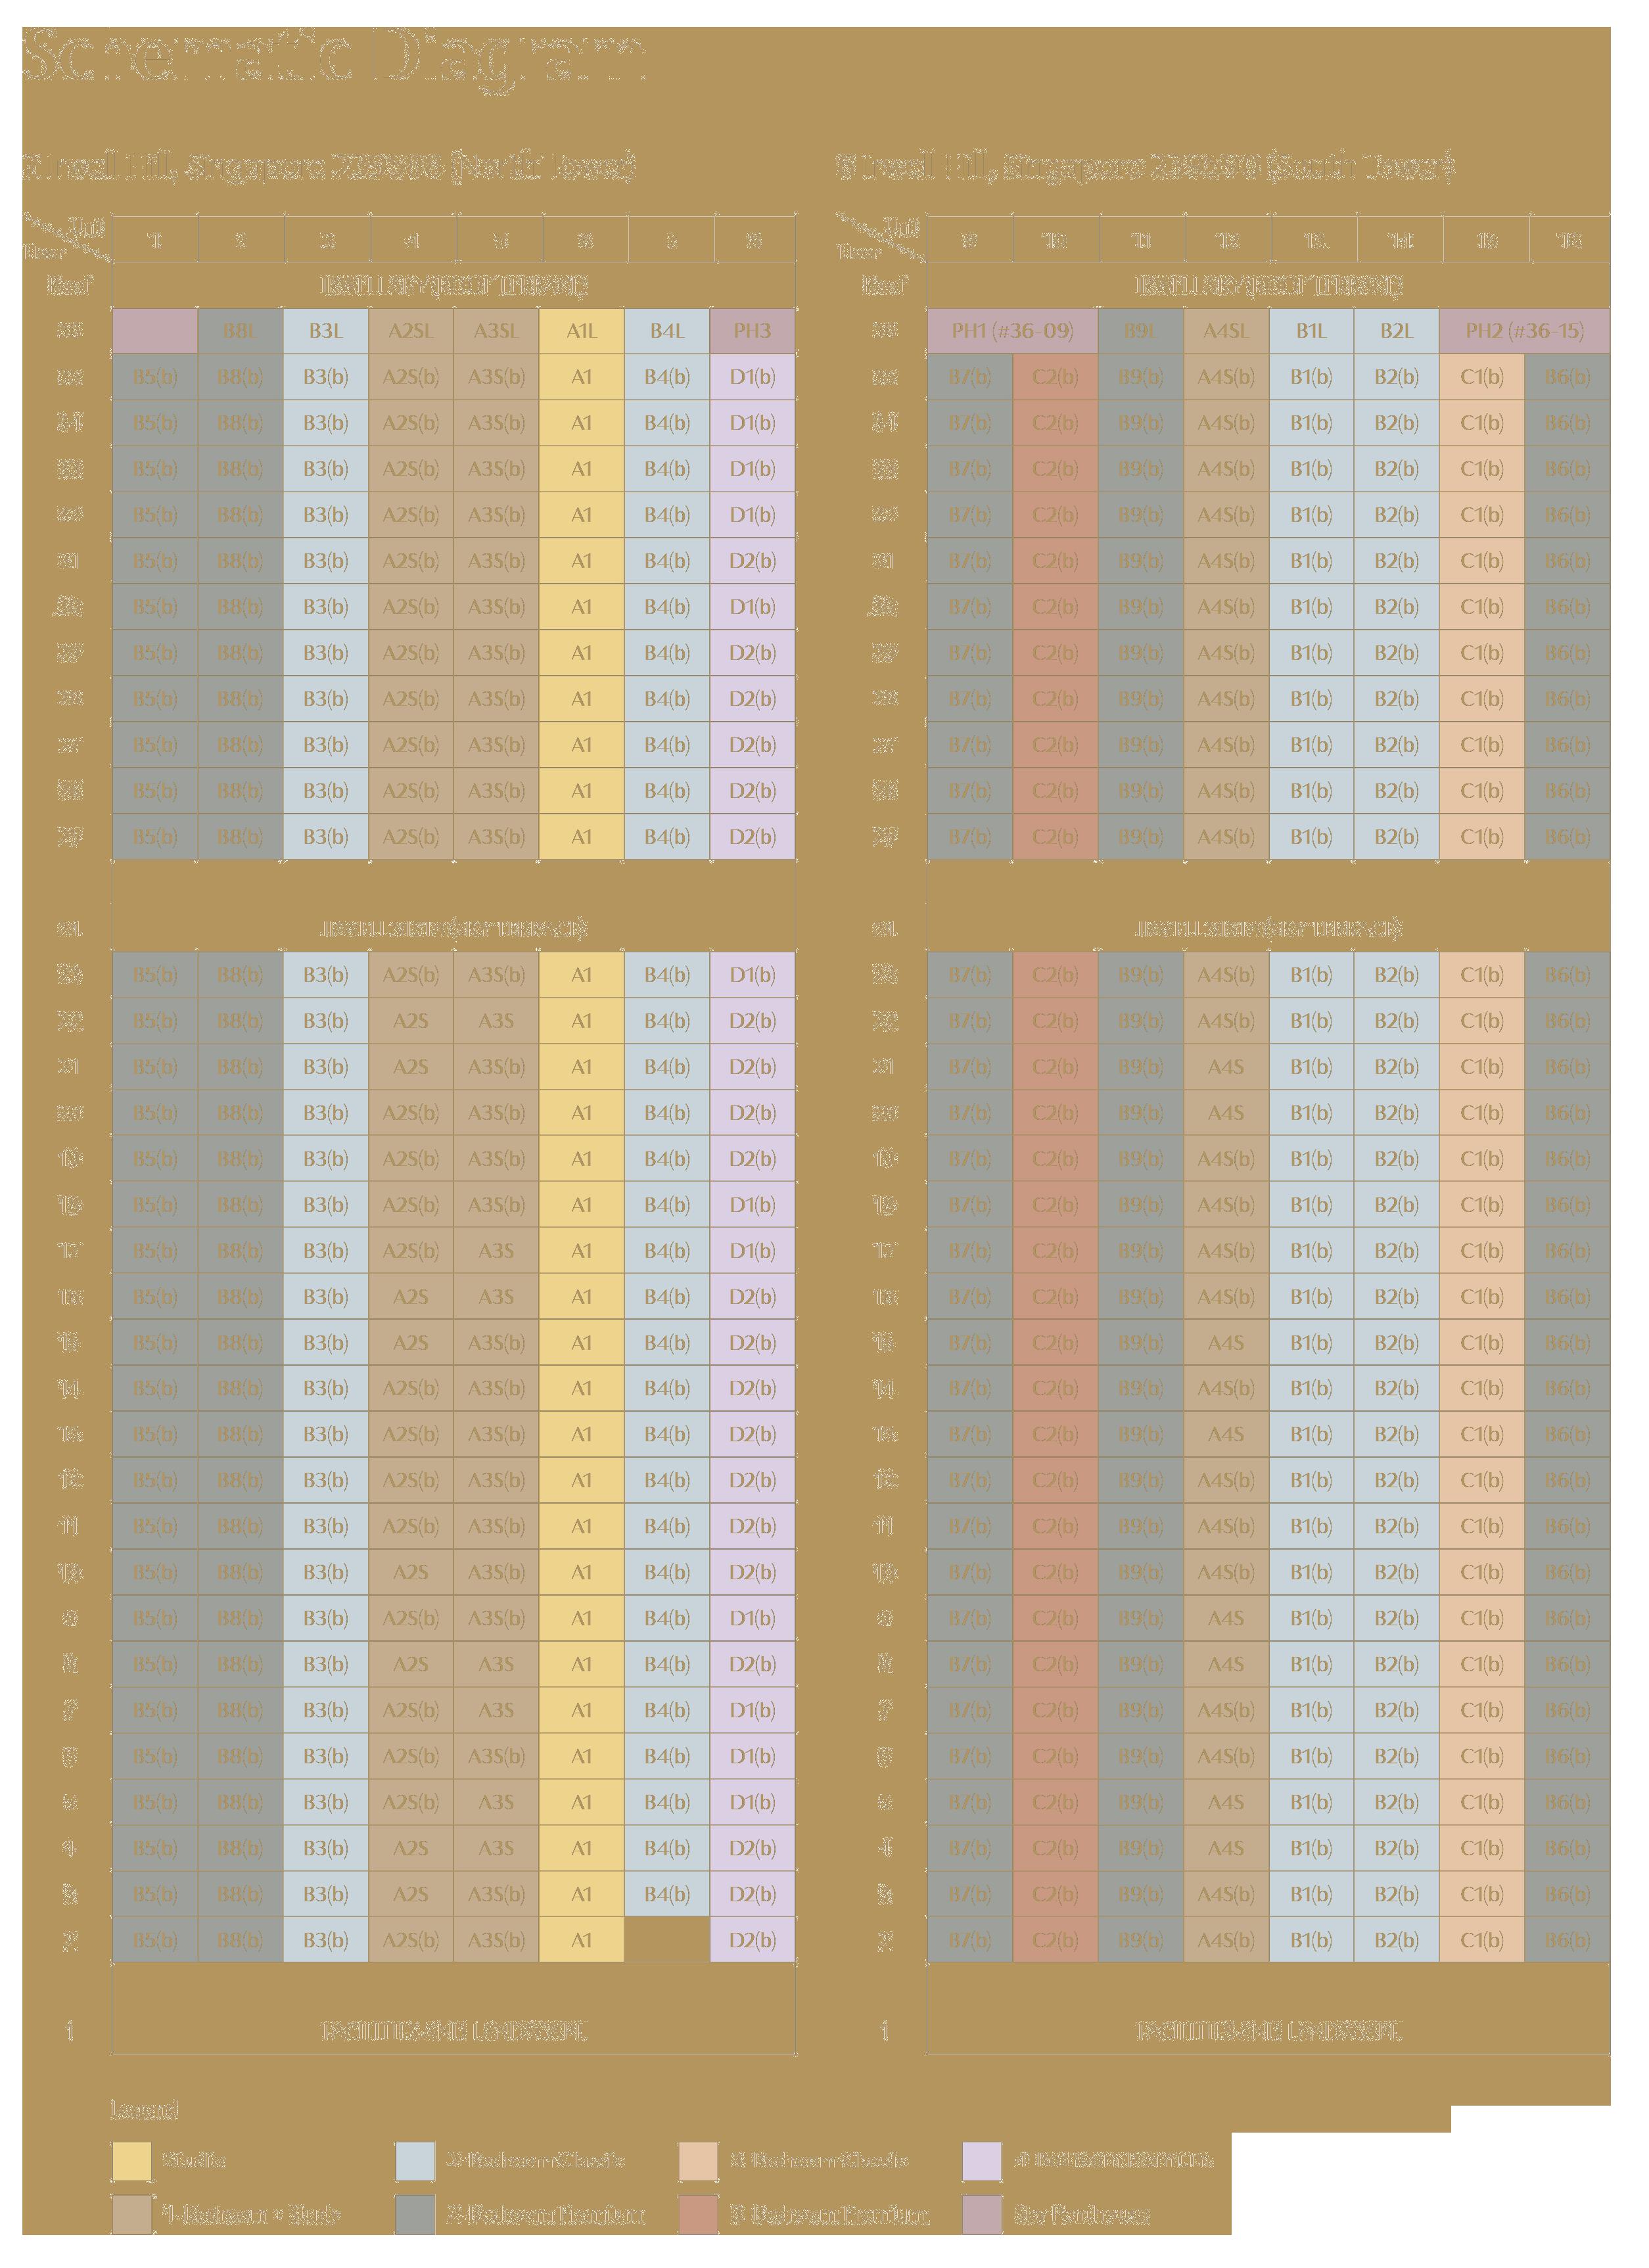 Irwell Hill Residences Elevation Chart 2